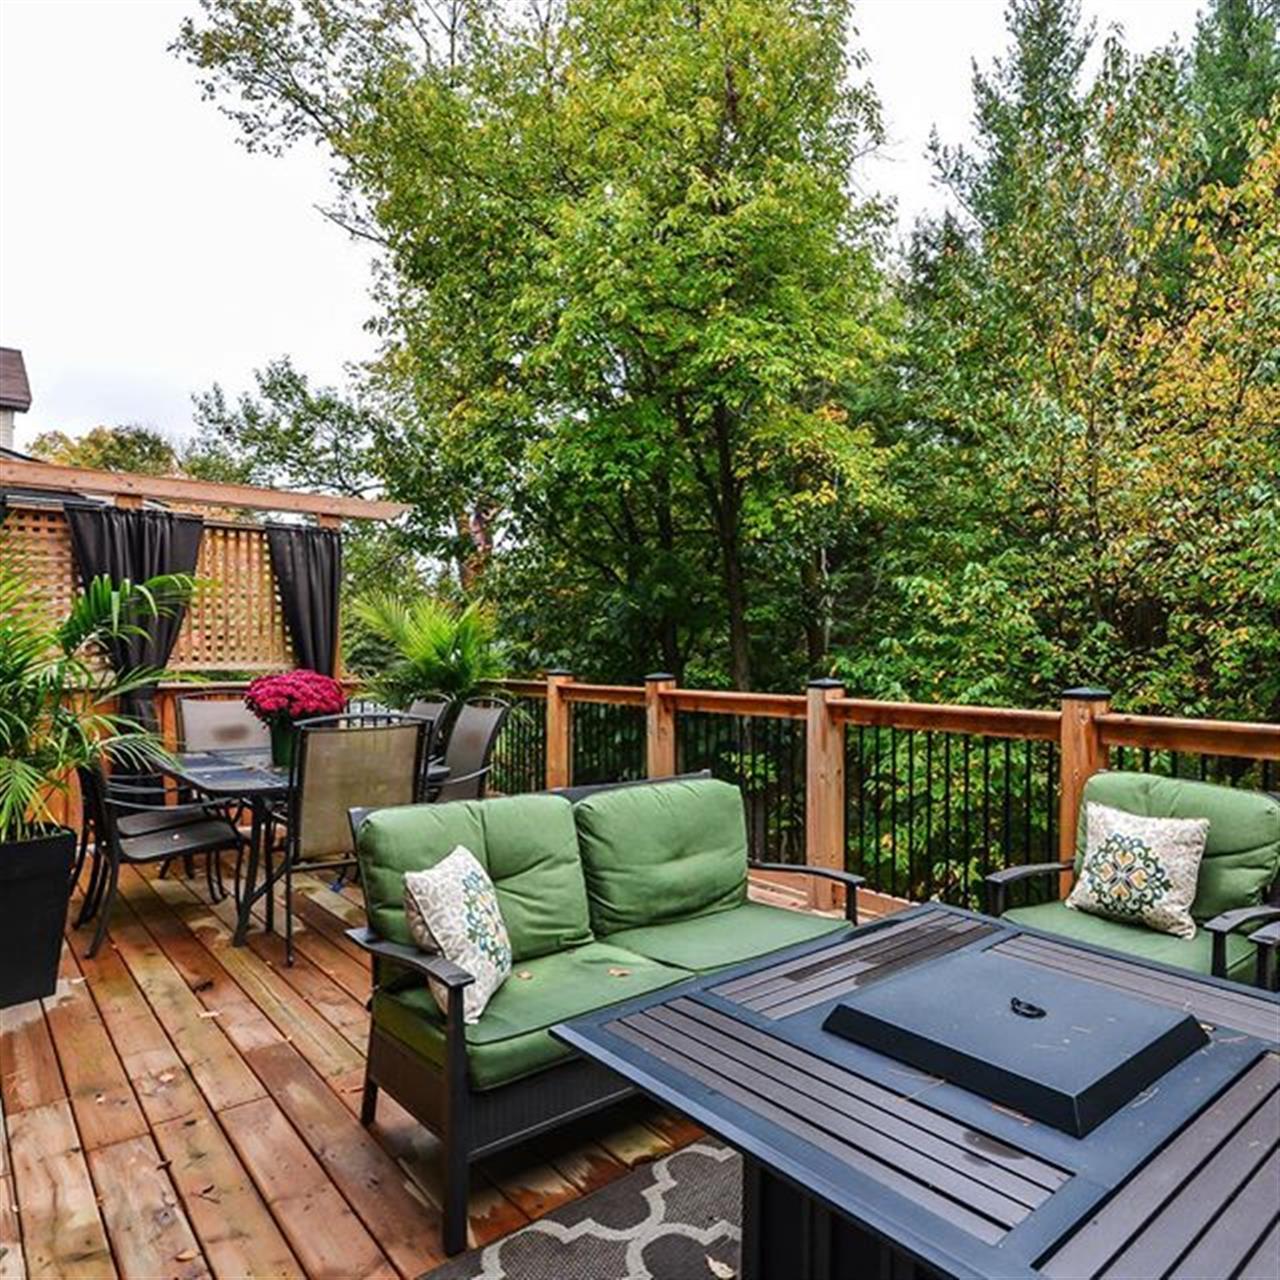 Ohh yah! This stylish #rockwood home goes live tomorrow --> @jasonsmith467 - - - - #sneakpeak #justlisted #realestate #livehere #livehappy #lovewhereyoulive #backyard #outdoors #style #nature #inspiration #leadingre #leadingrelocal